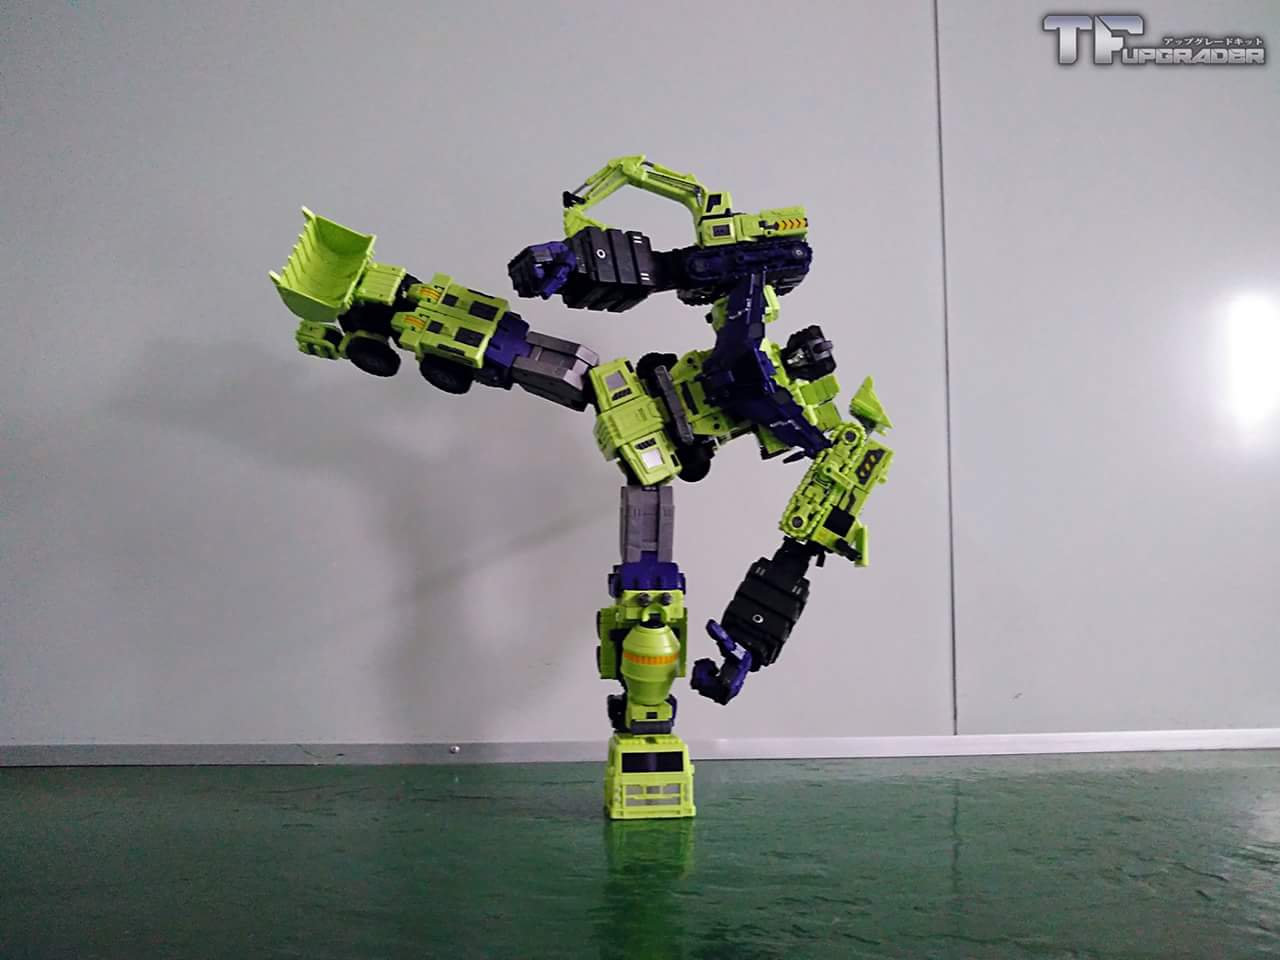 [Toyworld] Produit Tiers - Jouet TW-C Constructor aka Devastator/Dévastateur (Version vert G1 et jaune G2) - Page 4 NRnmINmE